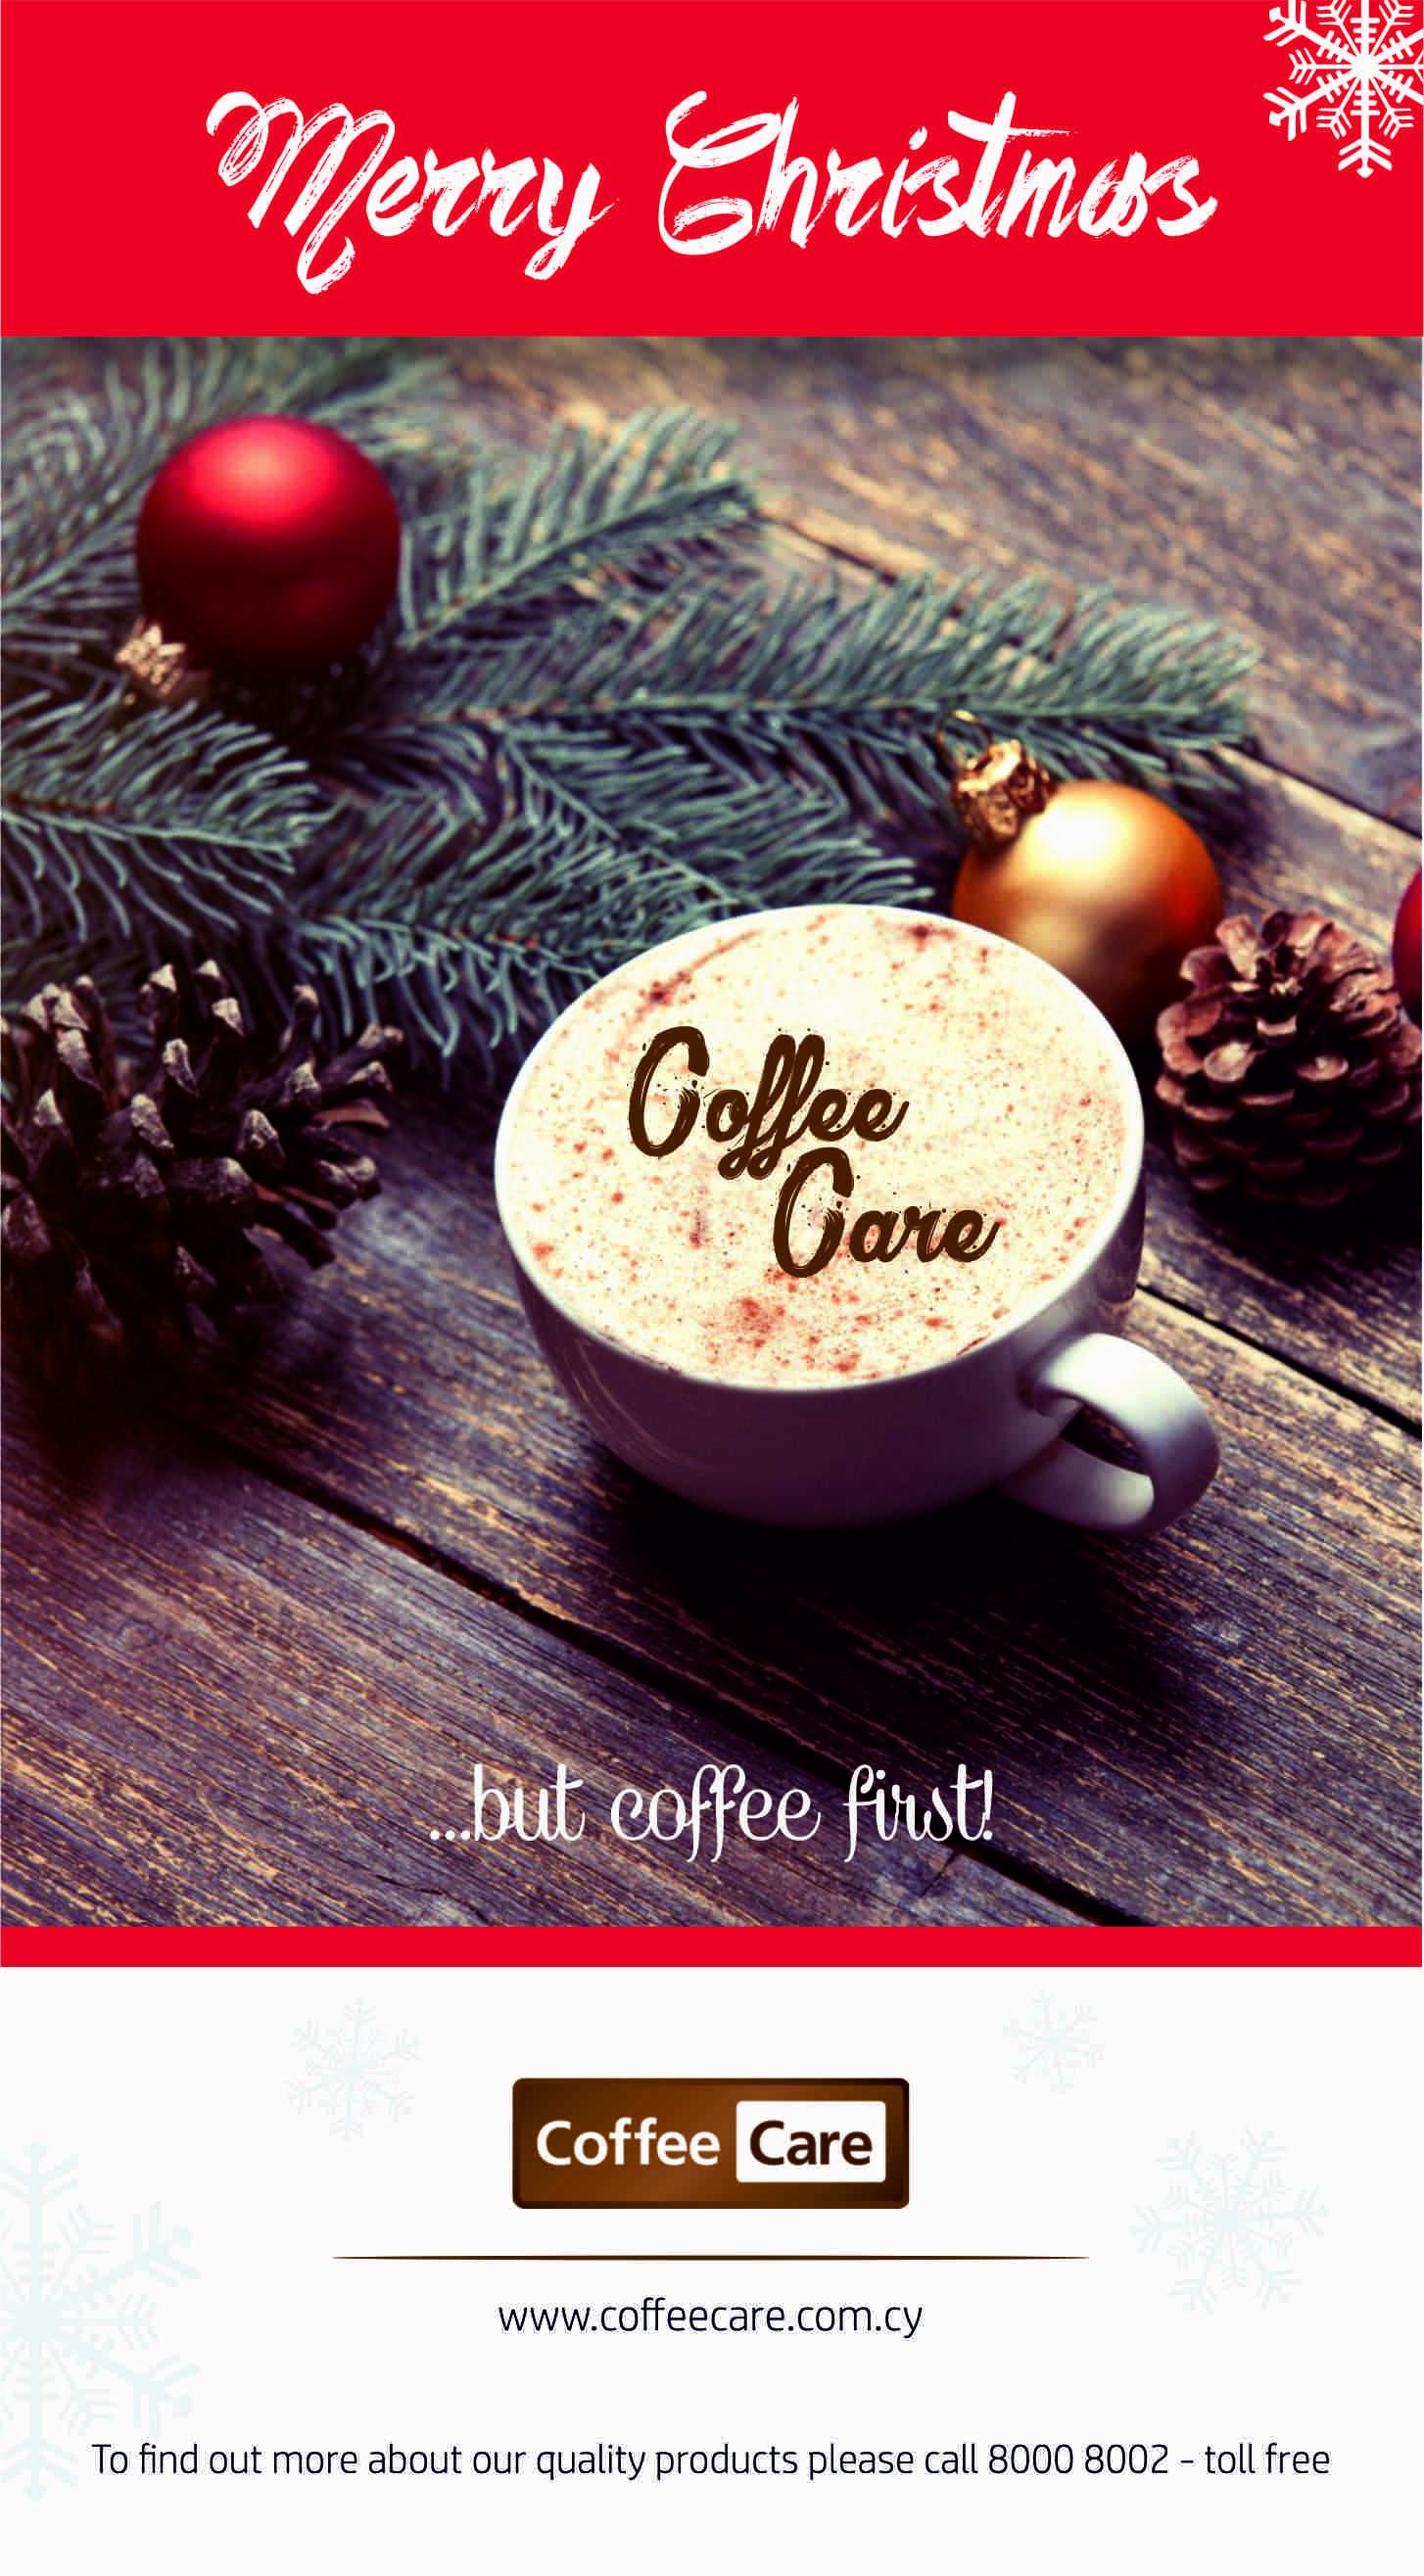 CoffeeCare-GoldenBay-ad-print